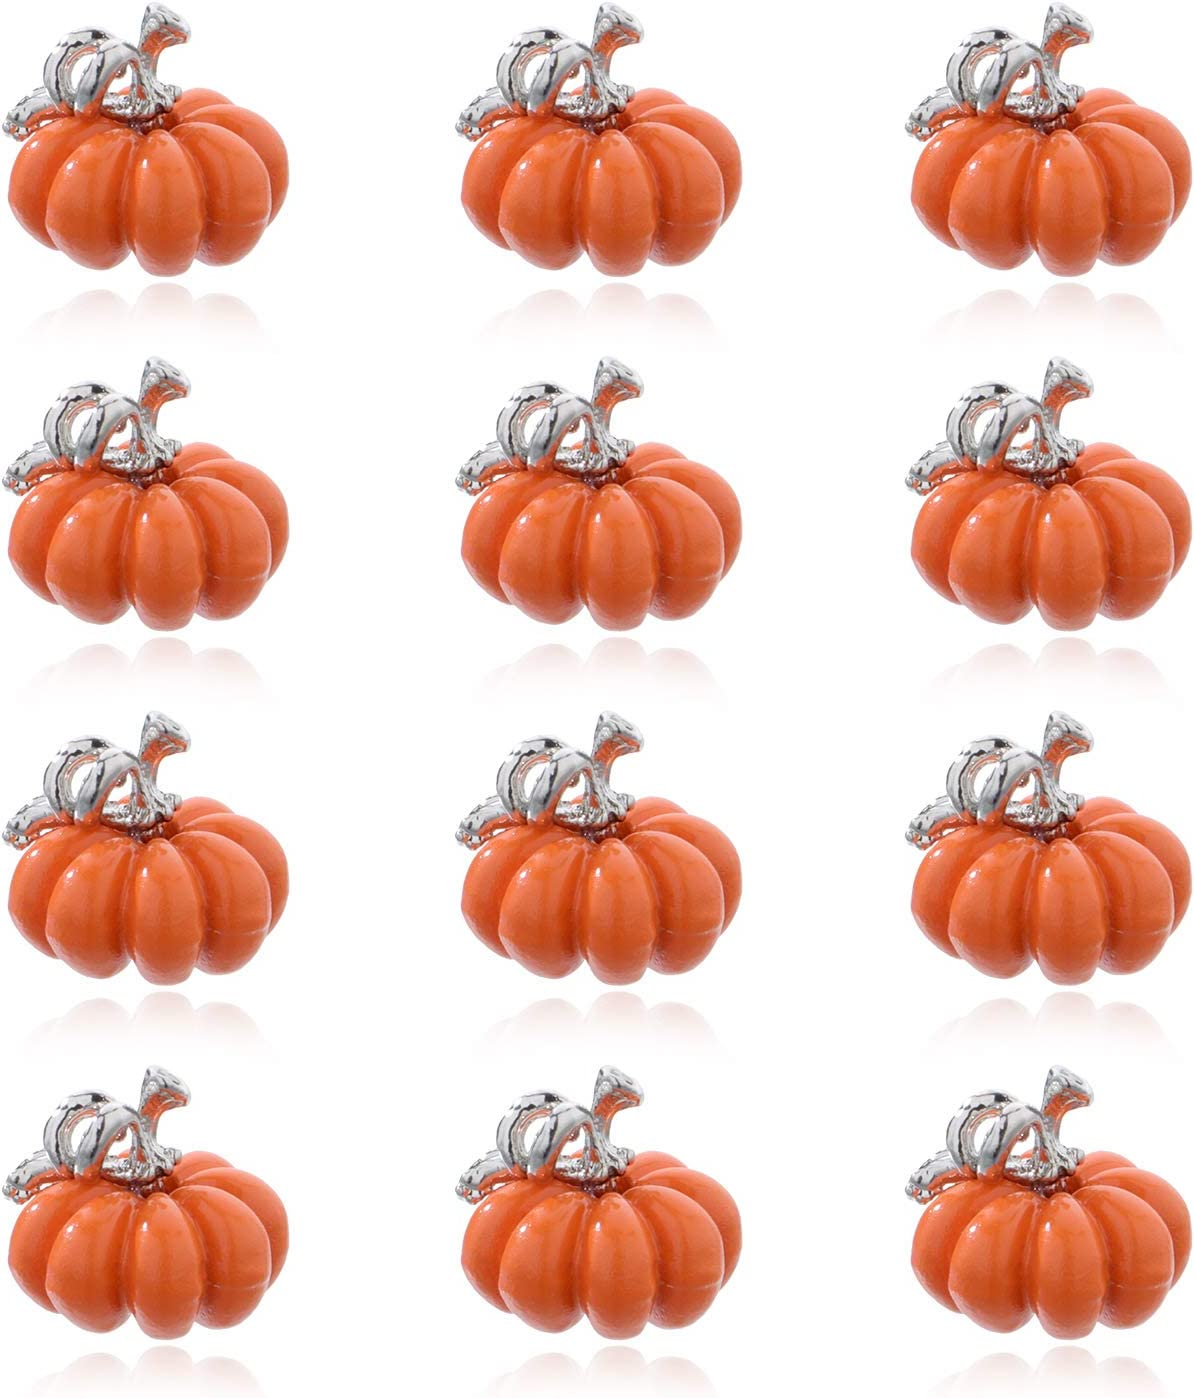 10Pcs Charms Enamel Pumpkin Thanksgiving Halloween Pendant DIY Jewelry Findings